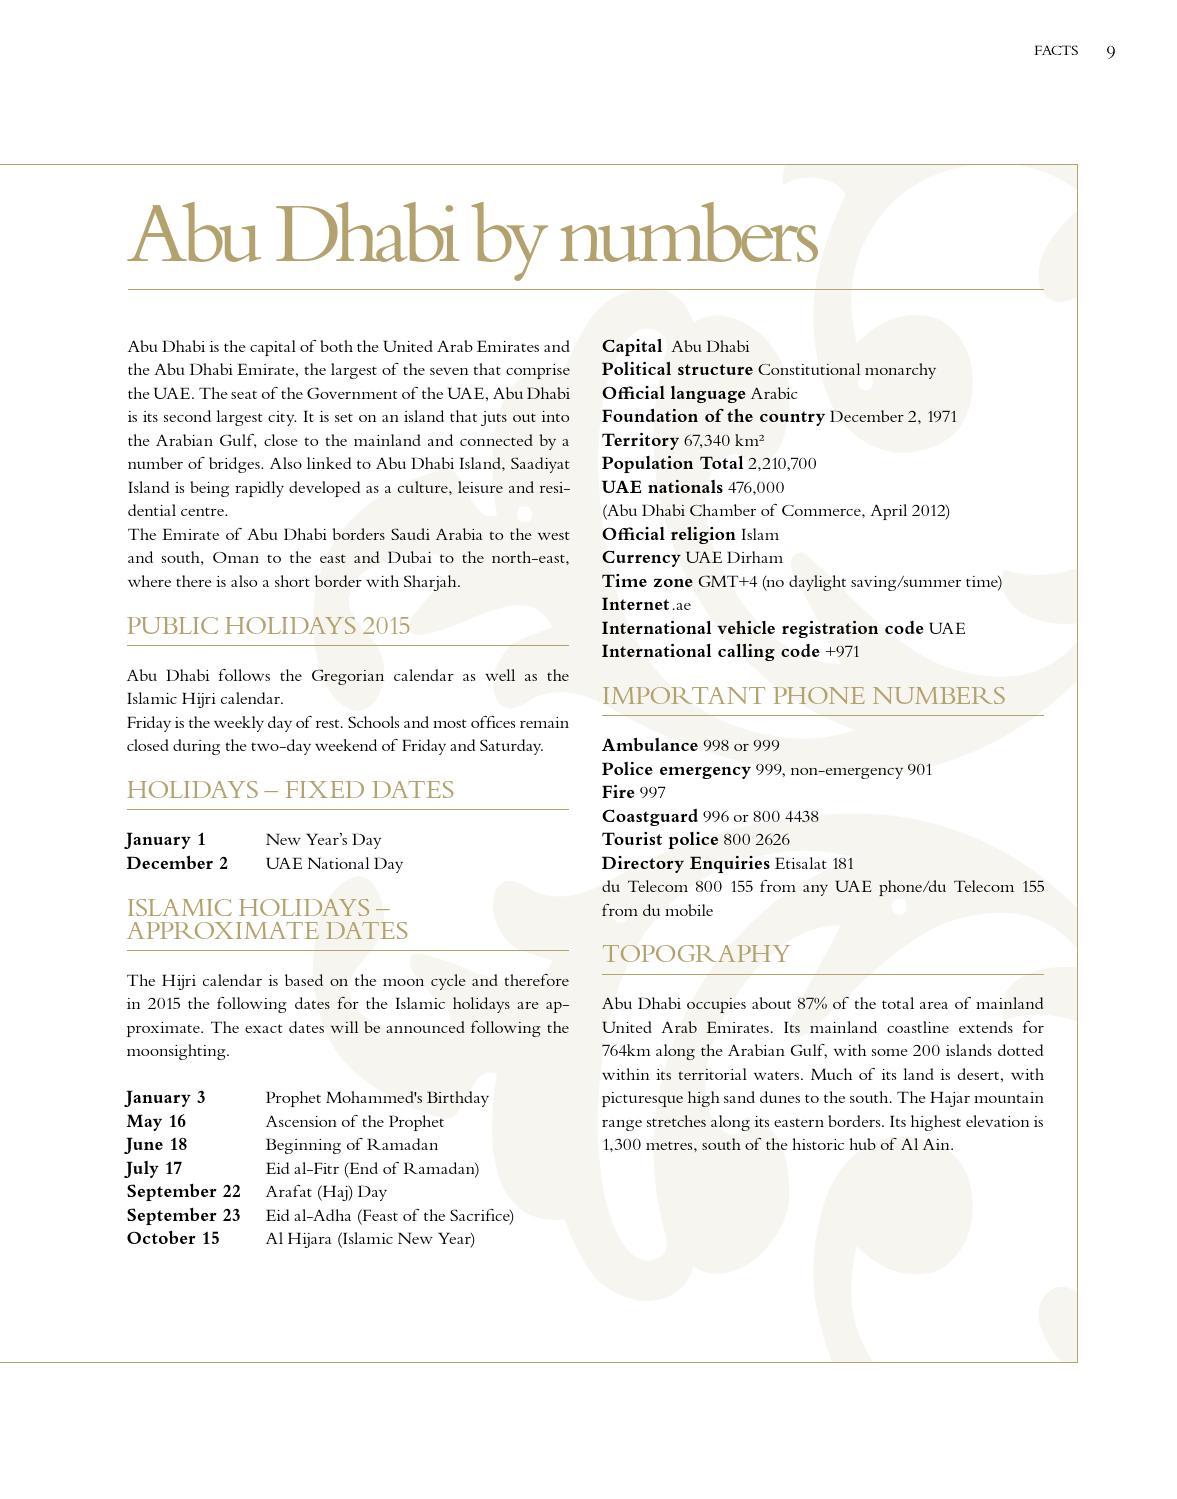 Luxury Abu Dhabi 2015 – eGuide – Jumeirah at Etihad Towers